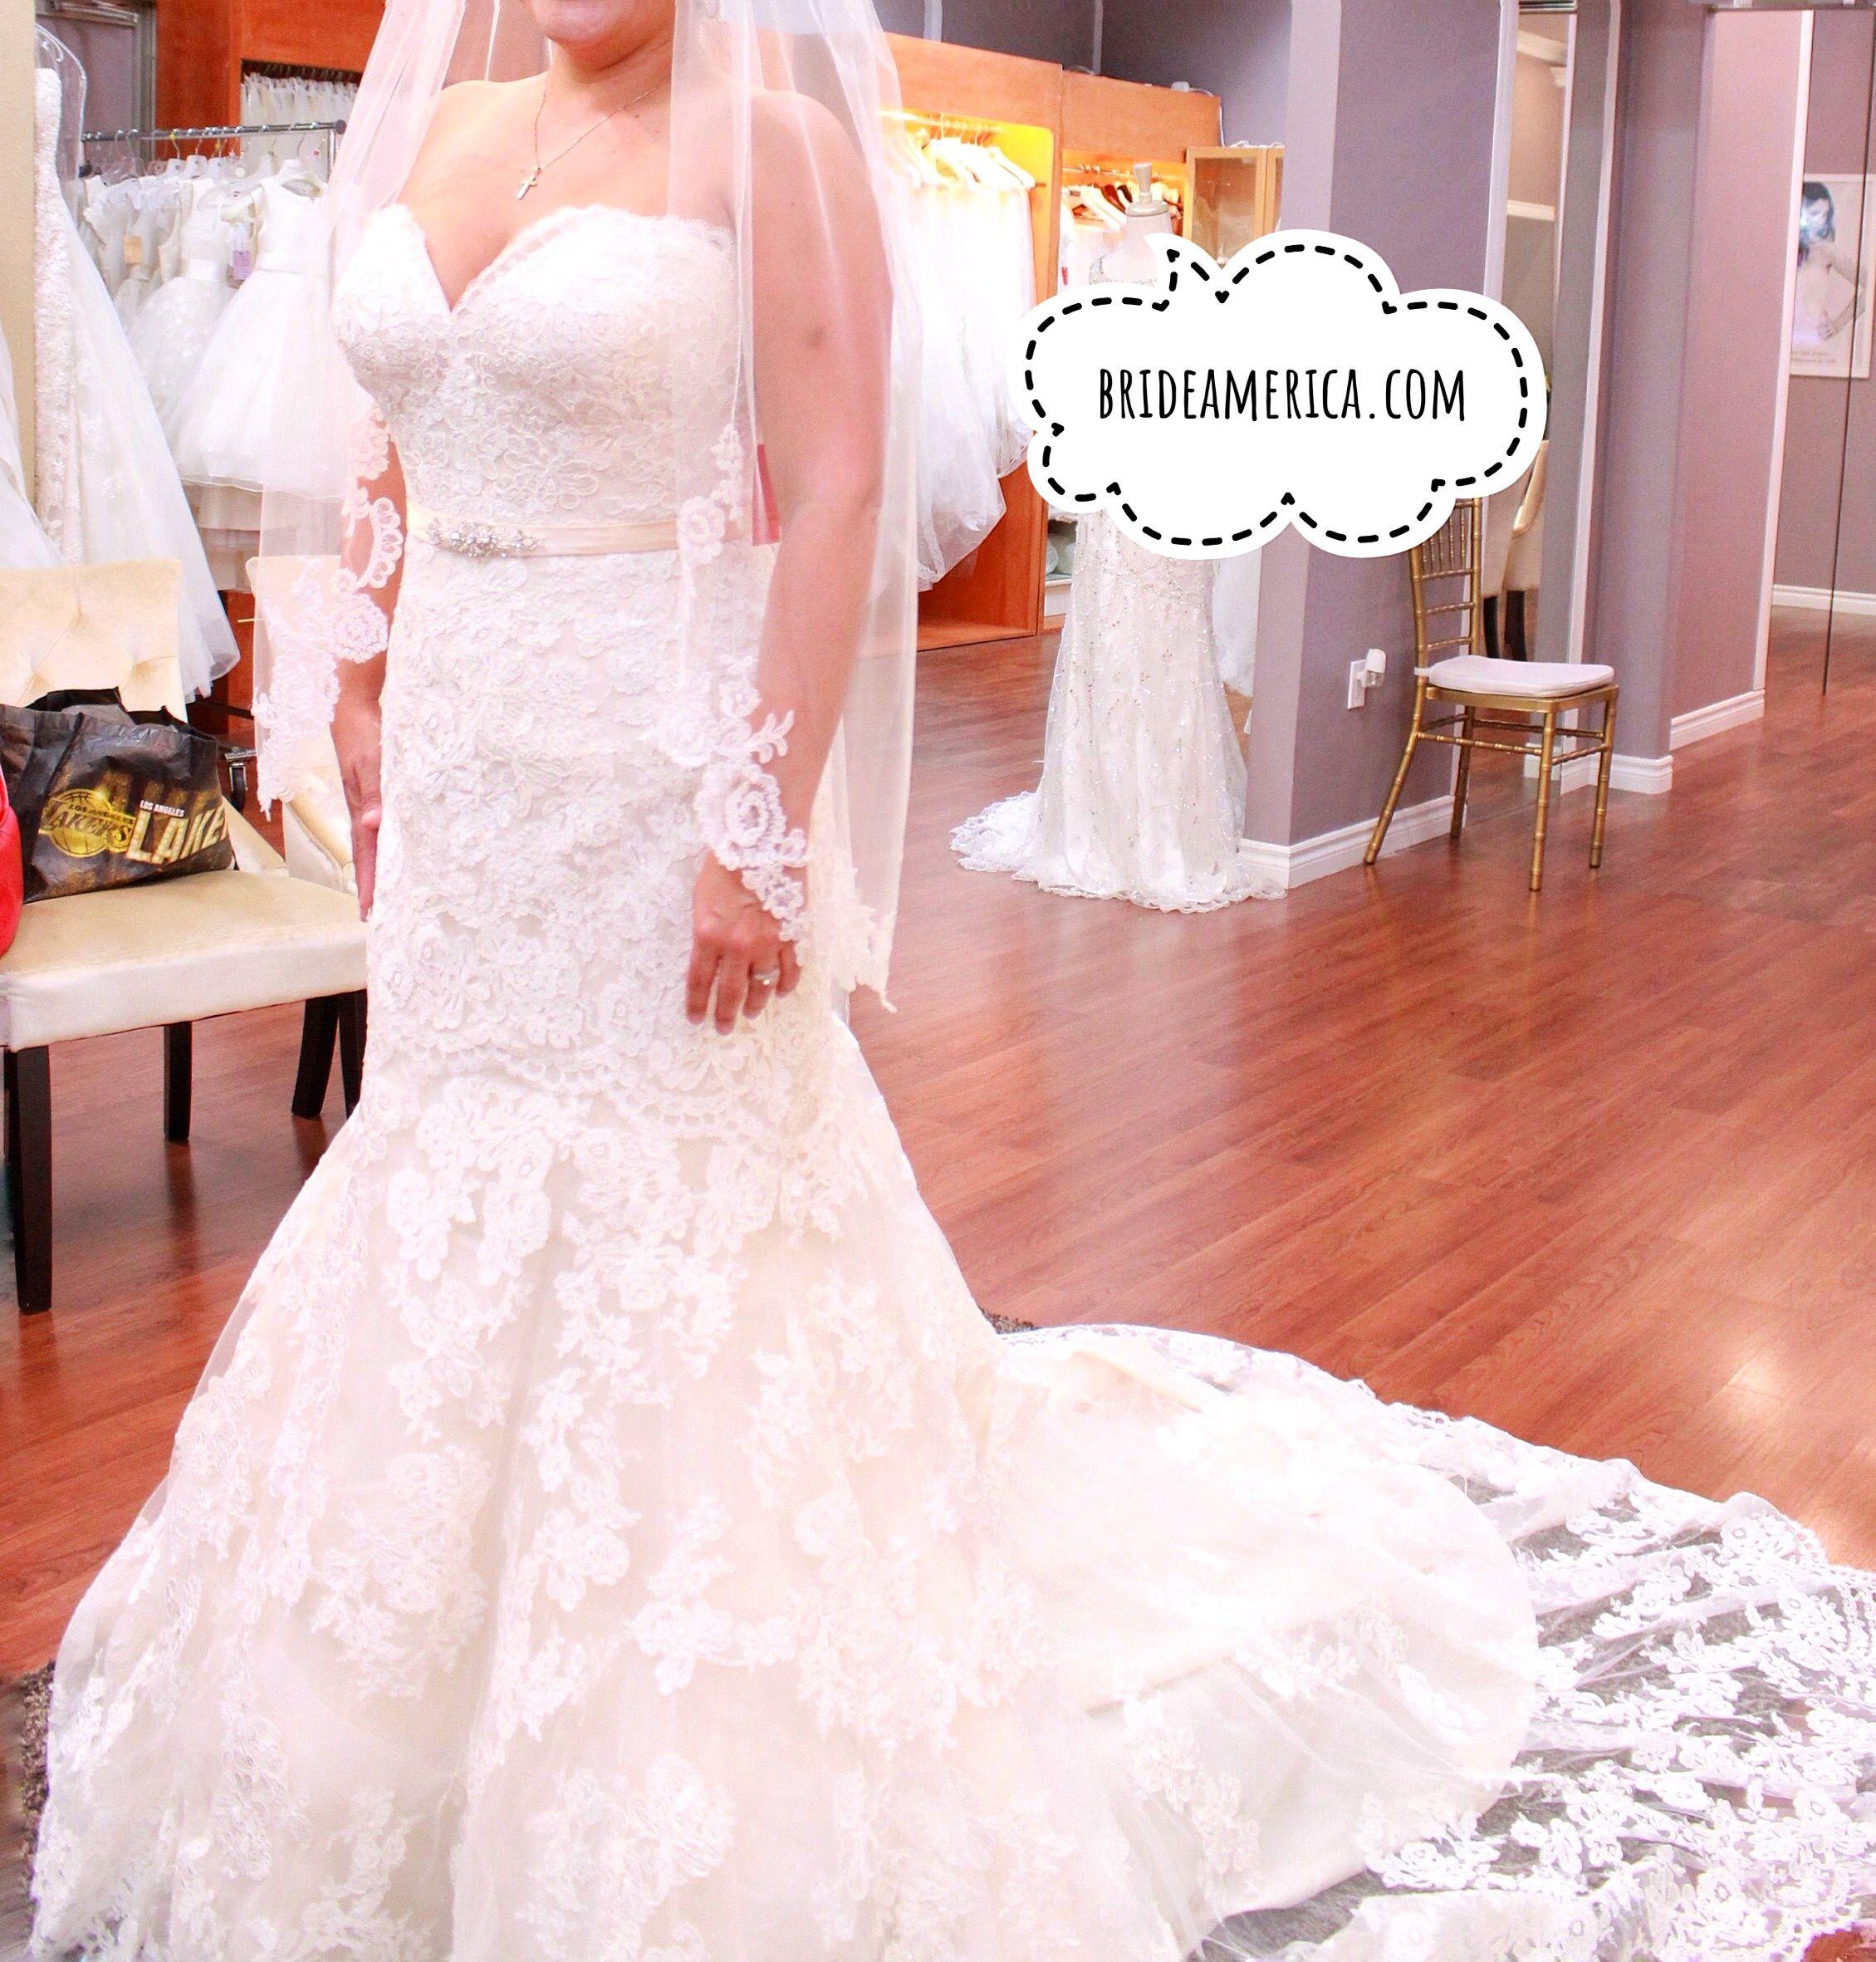 Wedding Dress at Bridal and Veil in San Diego, California. Beautiful ...